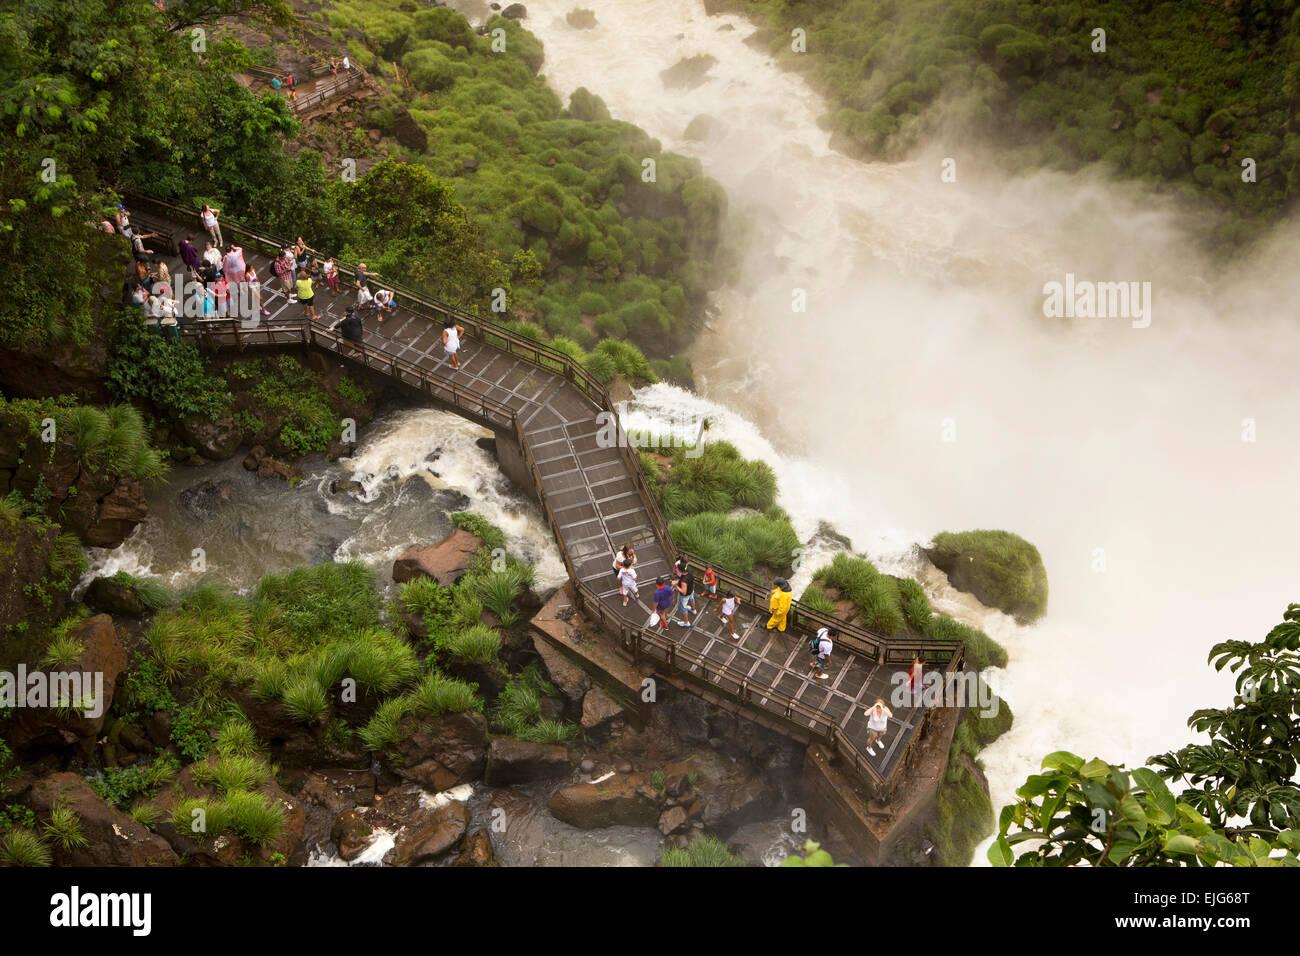 Argentina, Iguazu Falls, visitors on lower trail, Circuito Inferior, viewpoint below Salto Bossetti - Stock Image